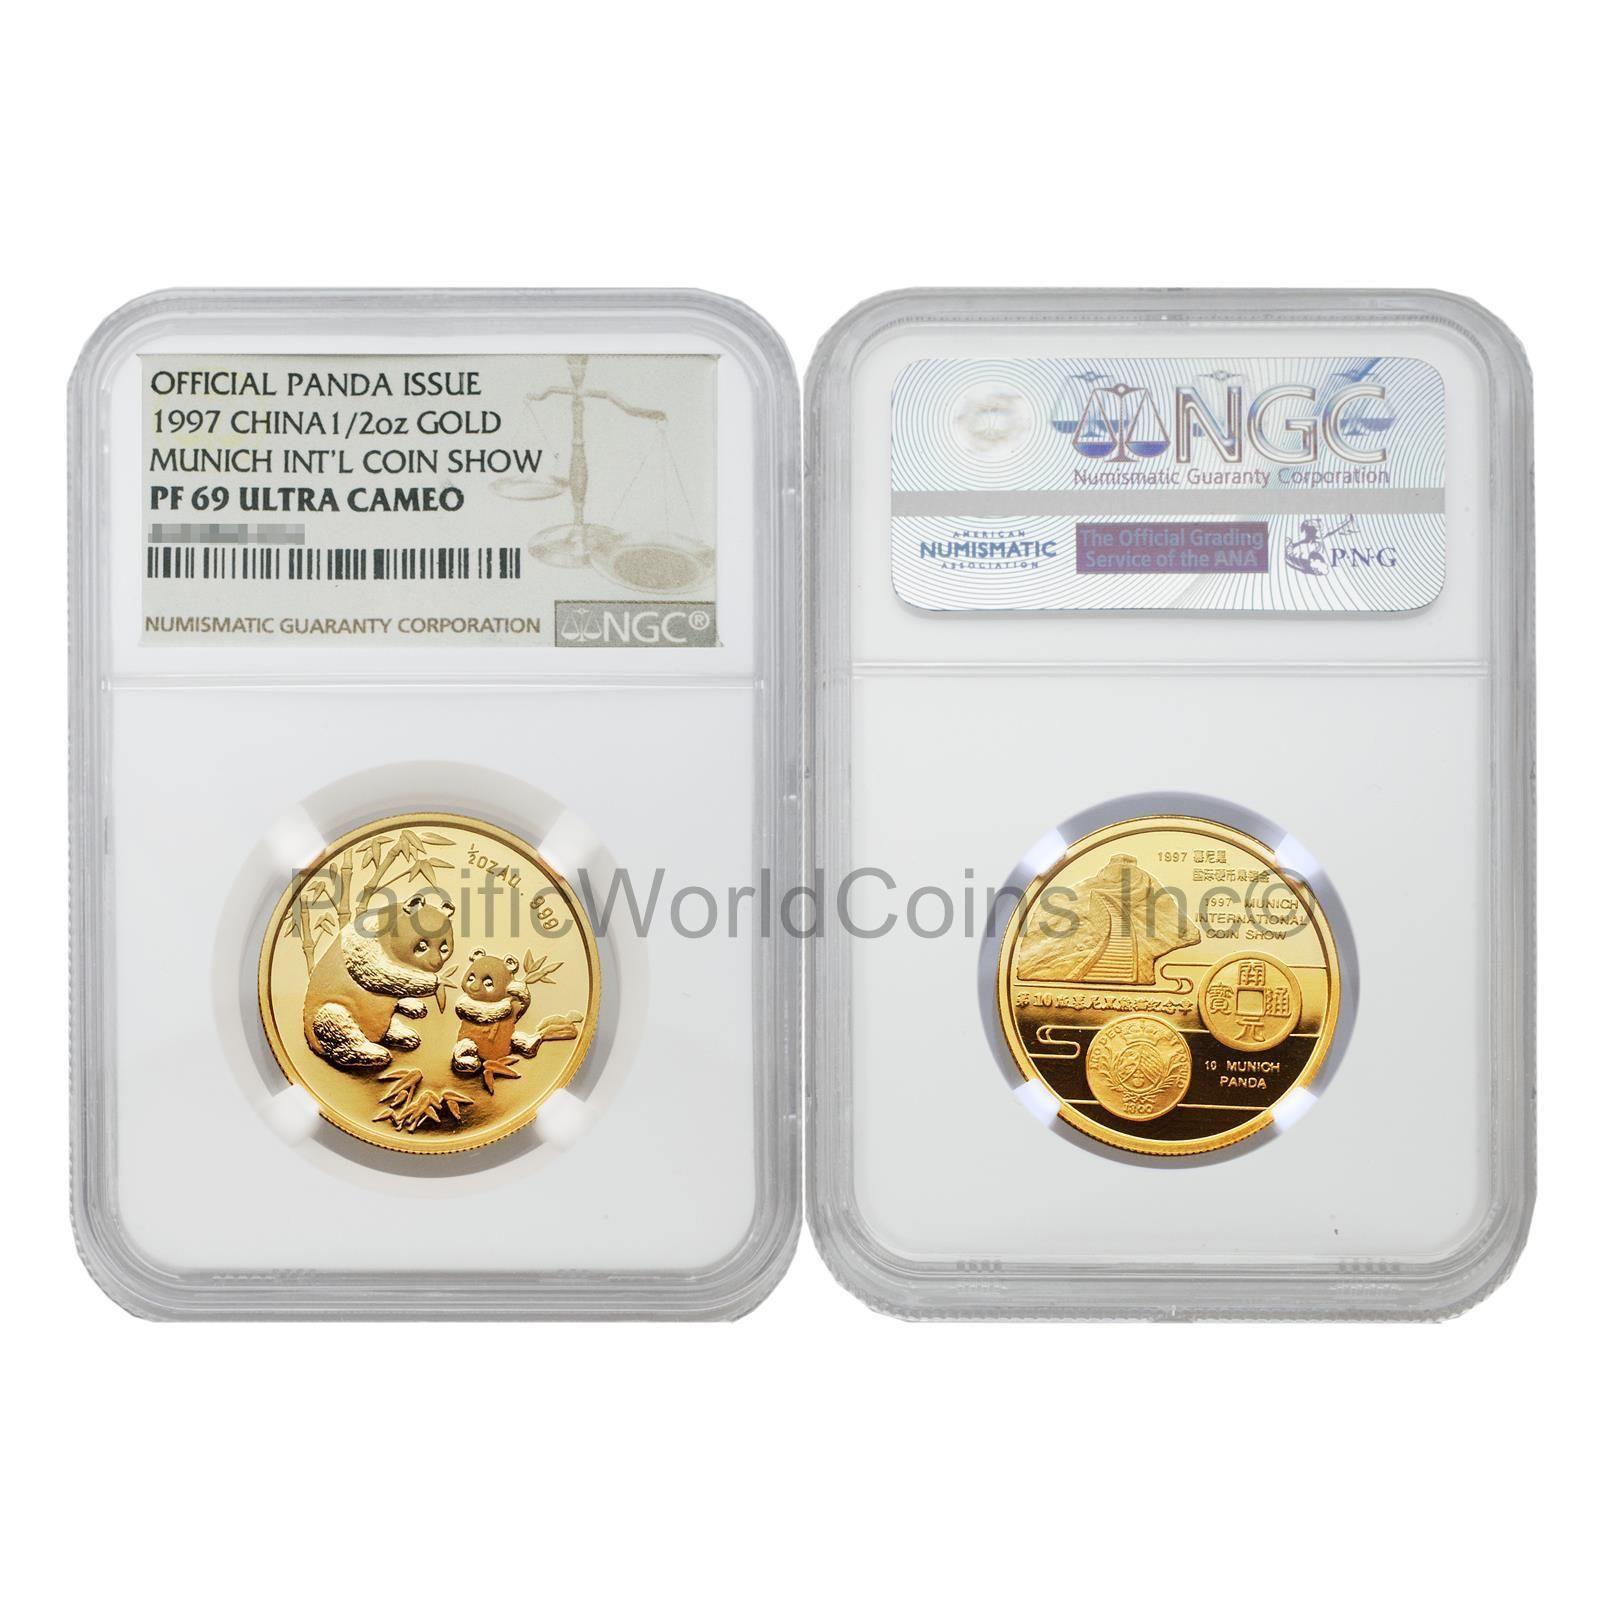 China  Panda Munich International Coin Show   Oz Gold Ngc Pf Ultra